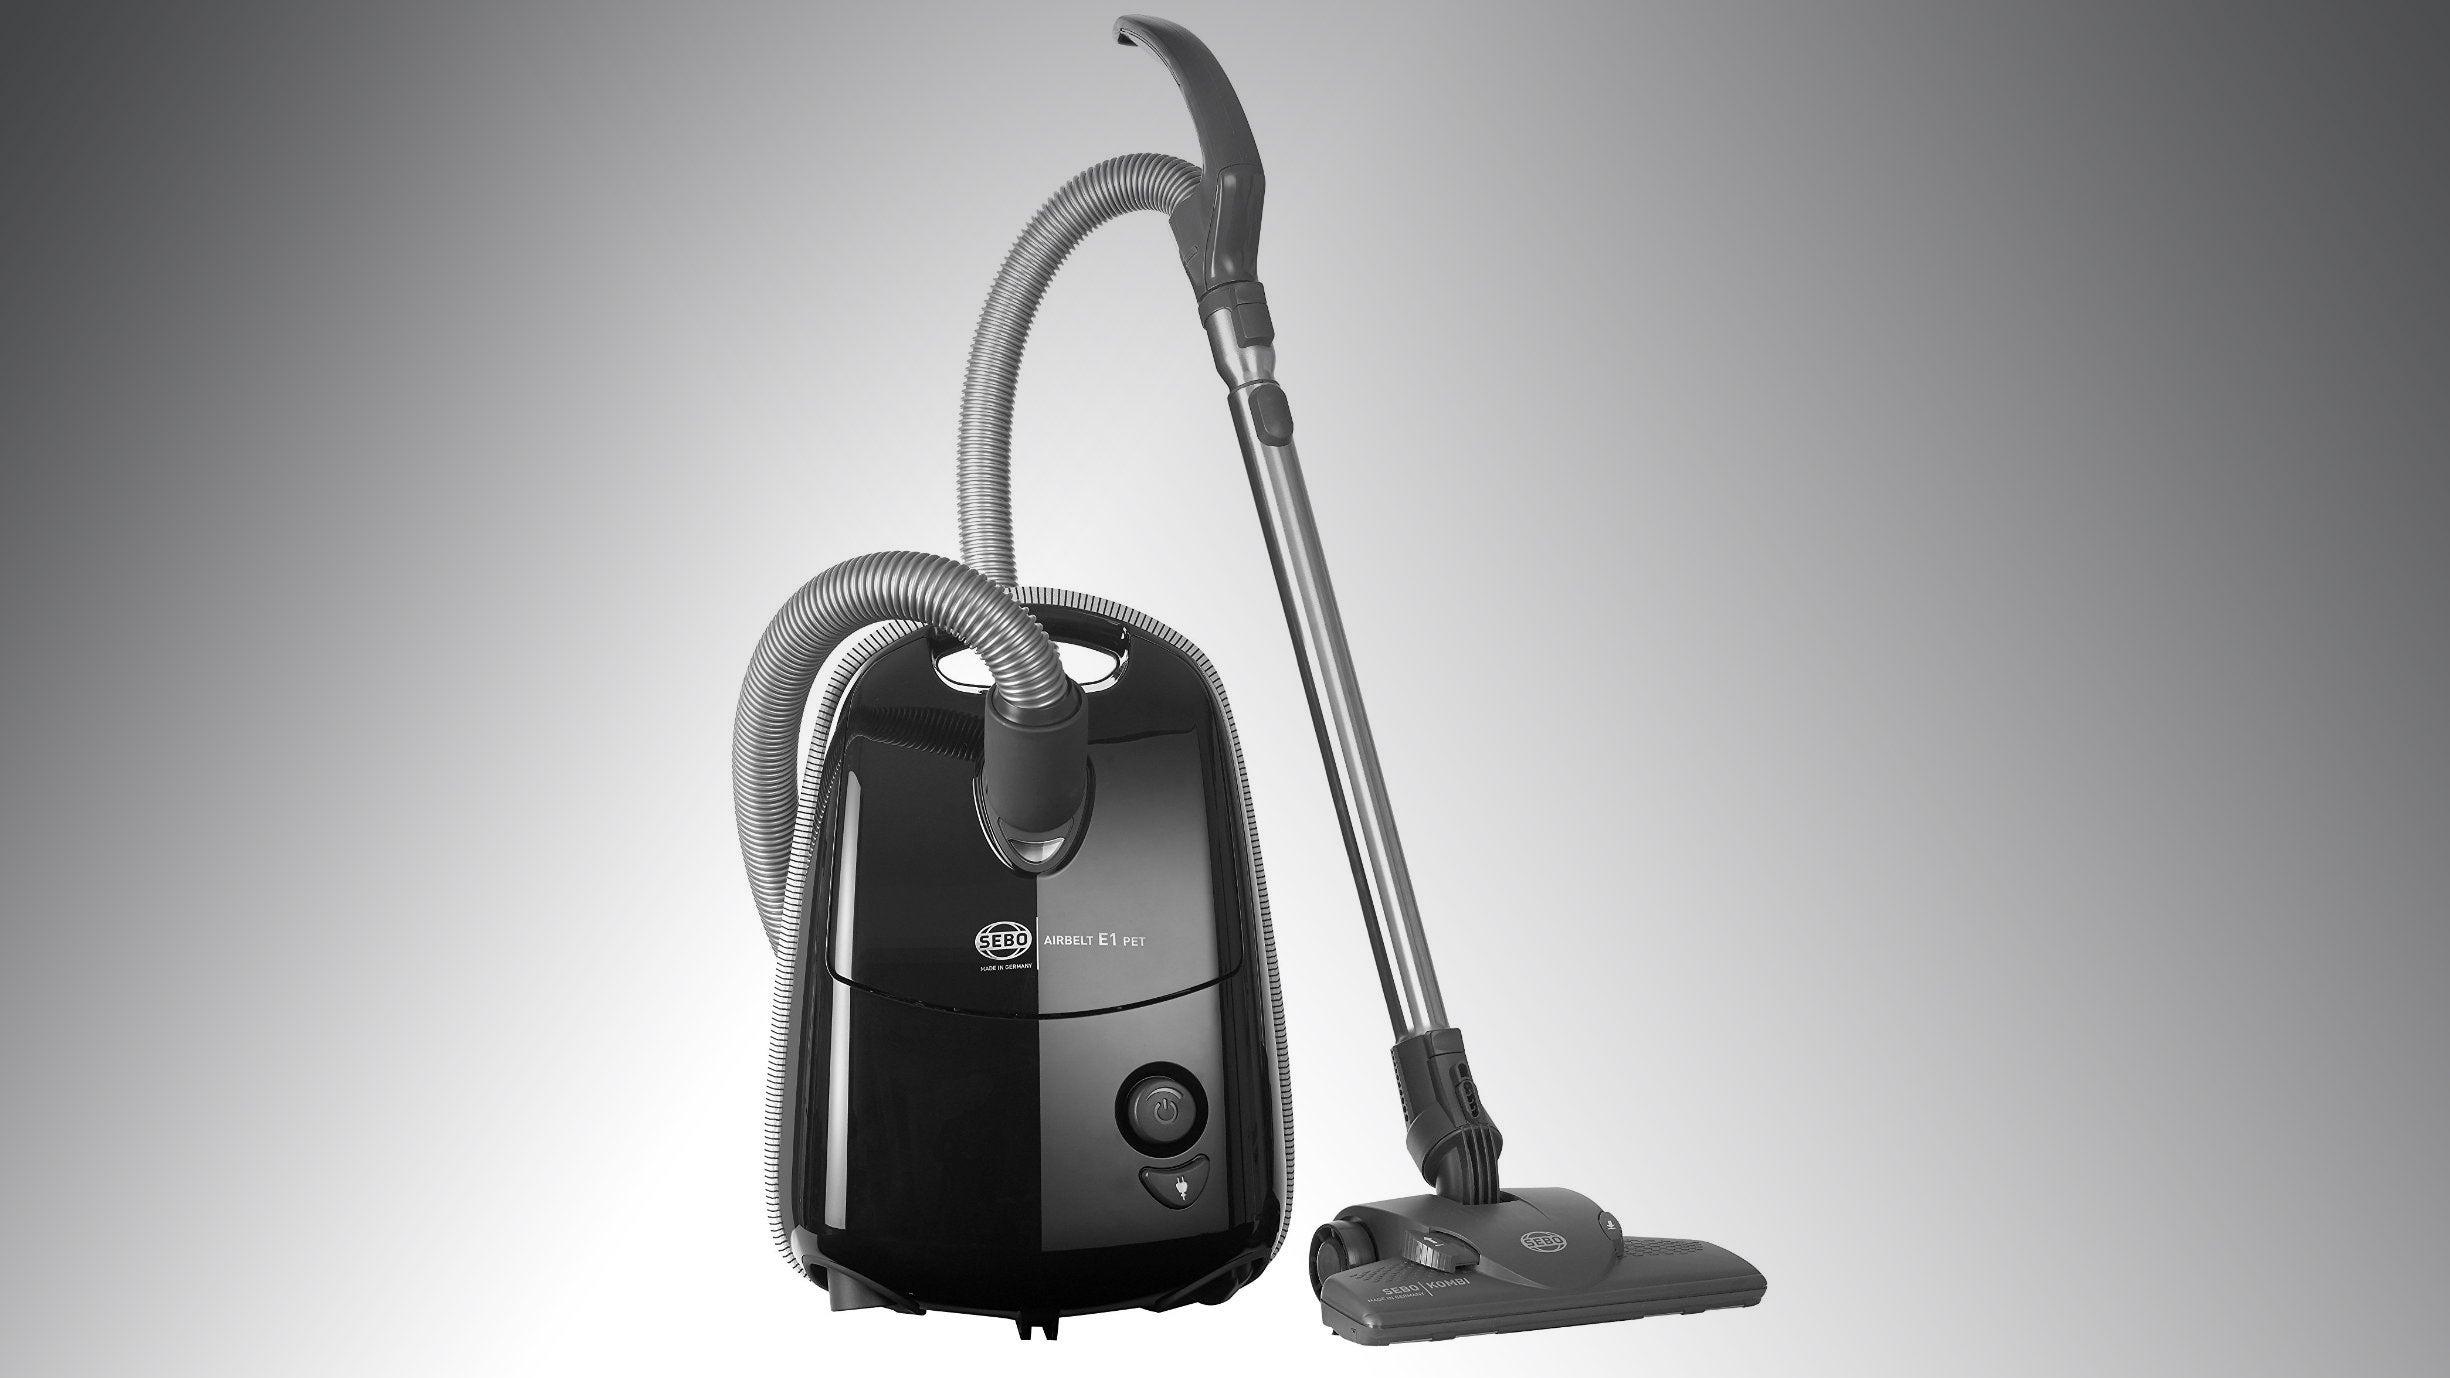 Sebo Carpet Cleaning Powder Reviews Vidalondon